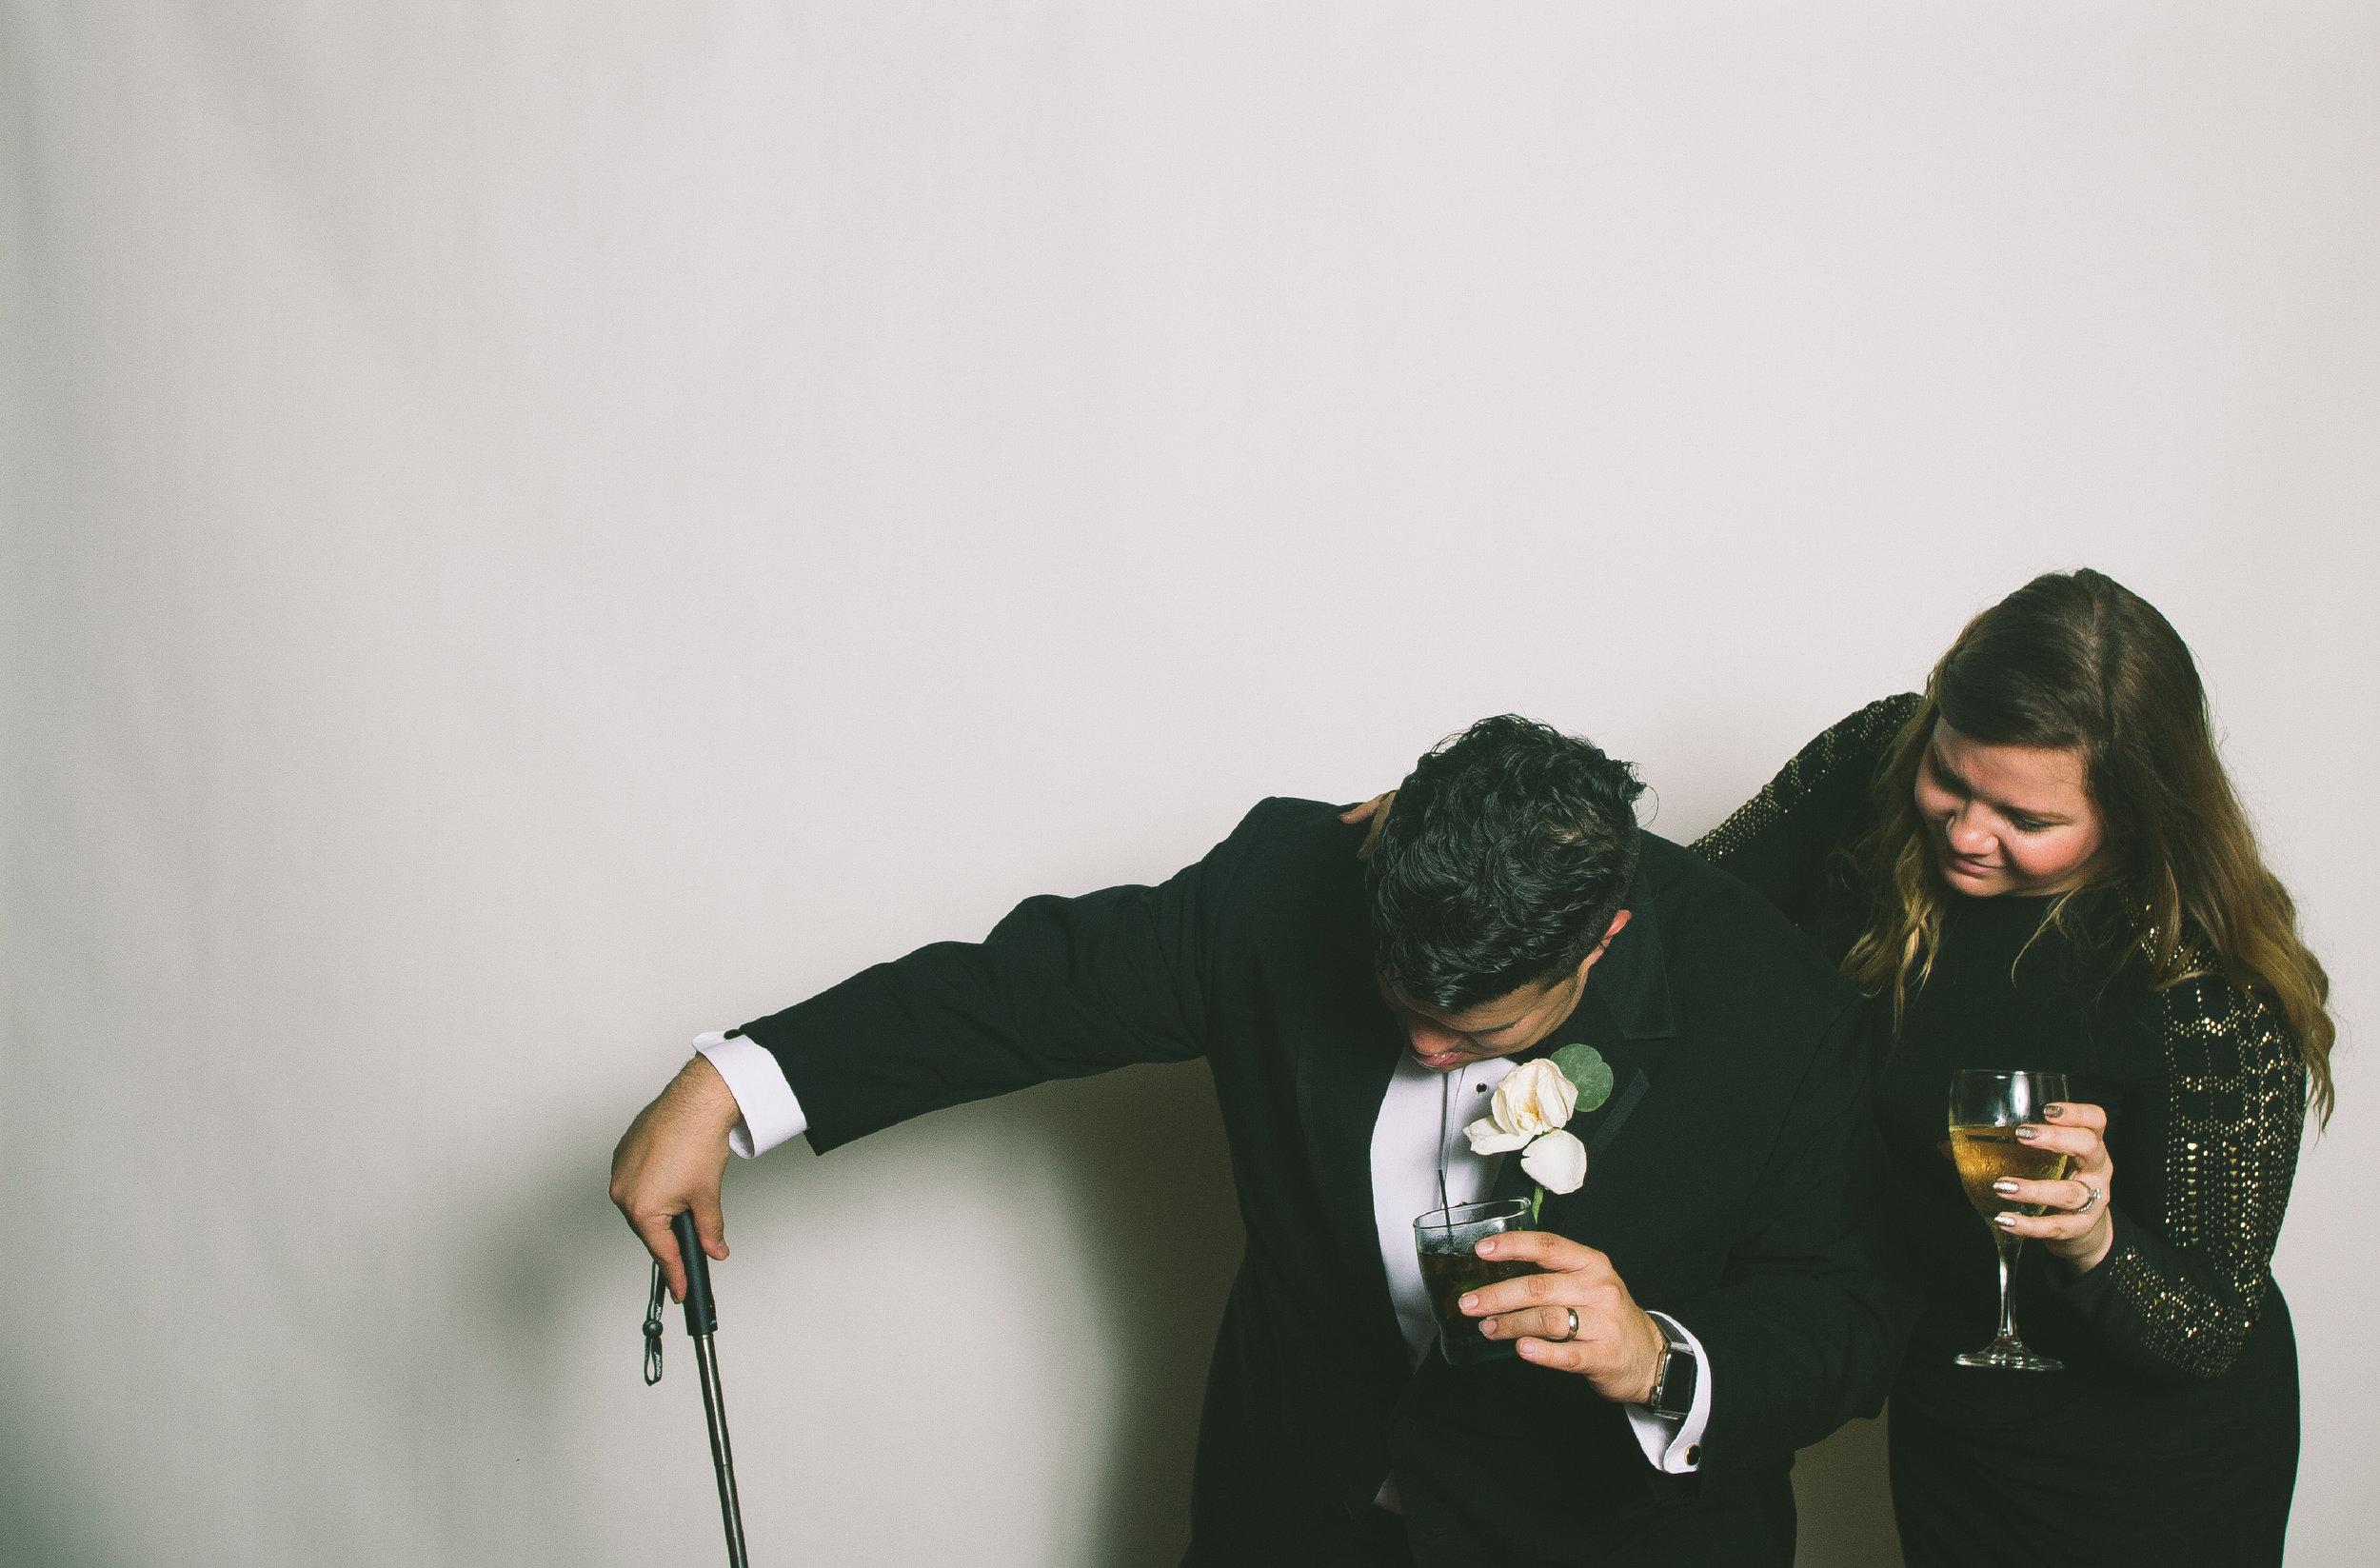 Marelys + Oscar Wedding Wackybooth Photobooth10.jpg